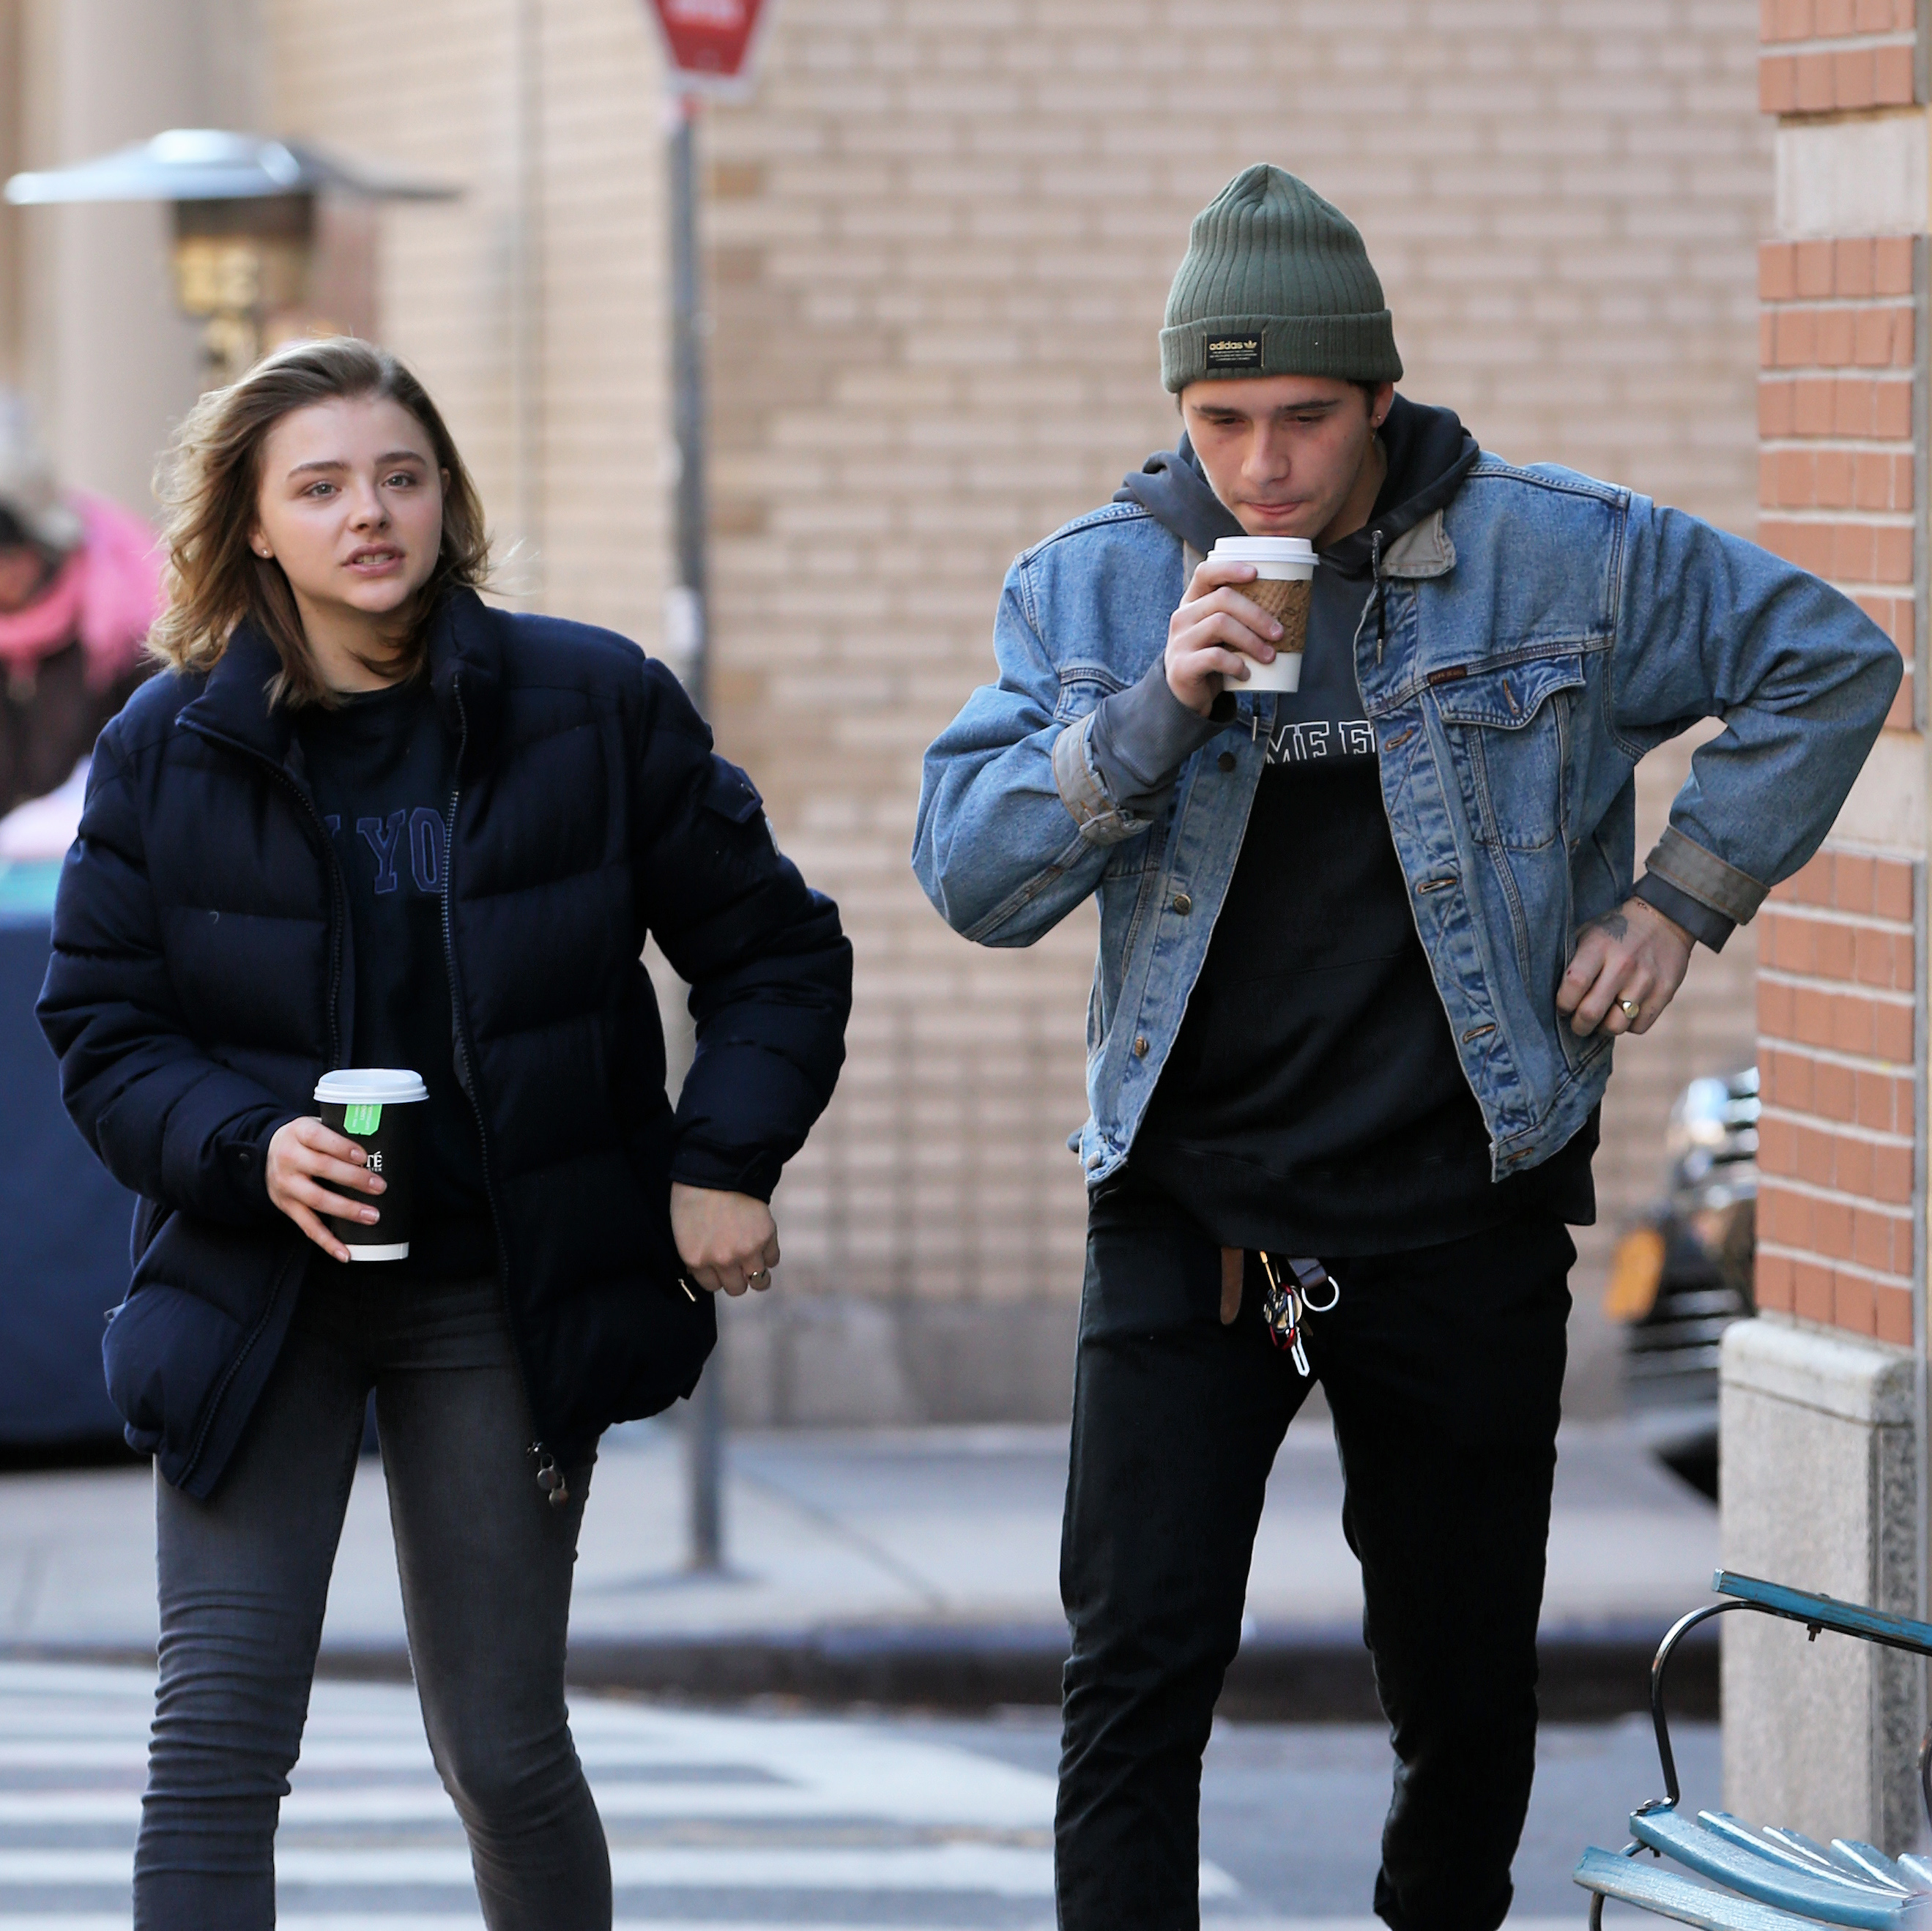 Chloe Moretz and Brooklyn Beckham wearing matching